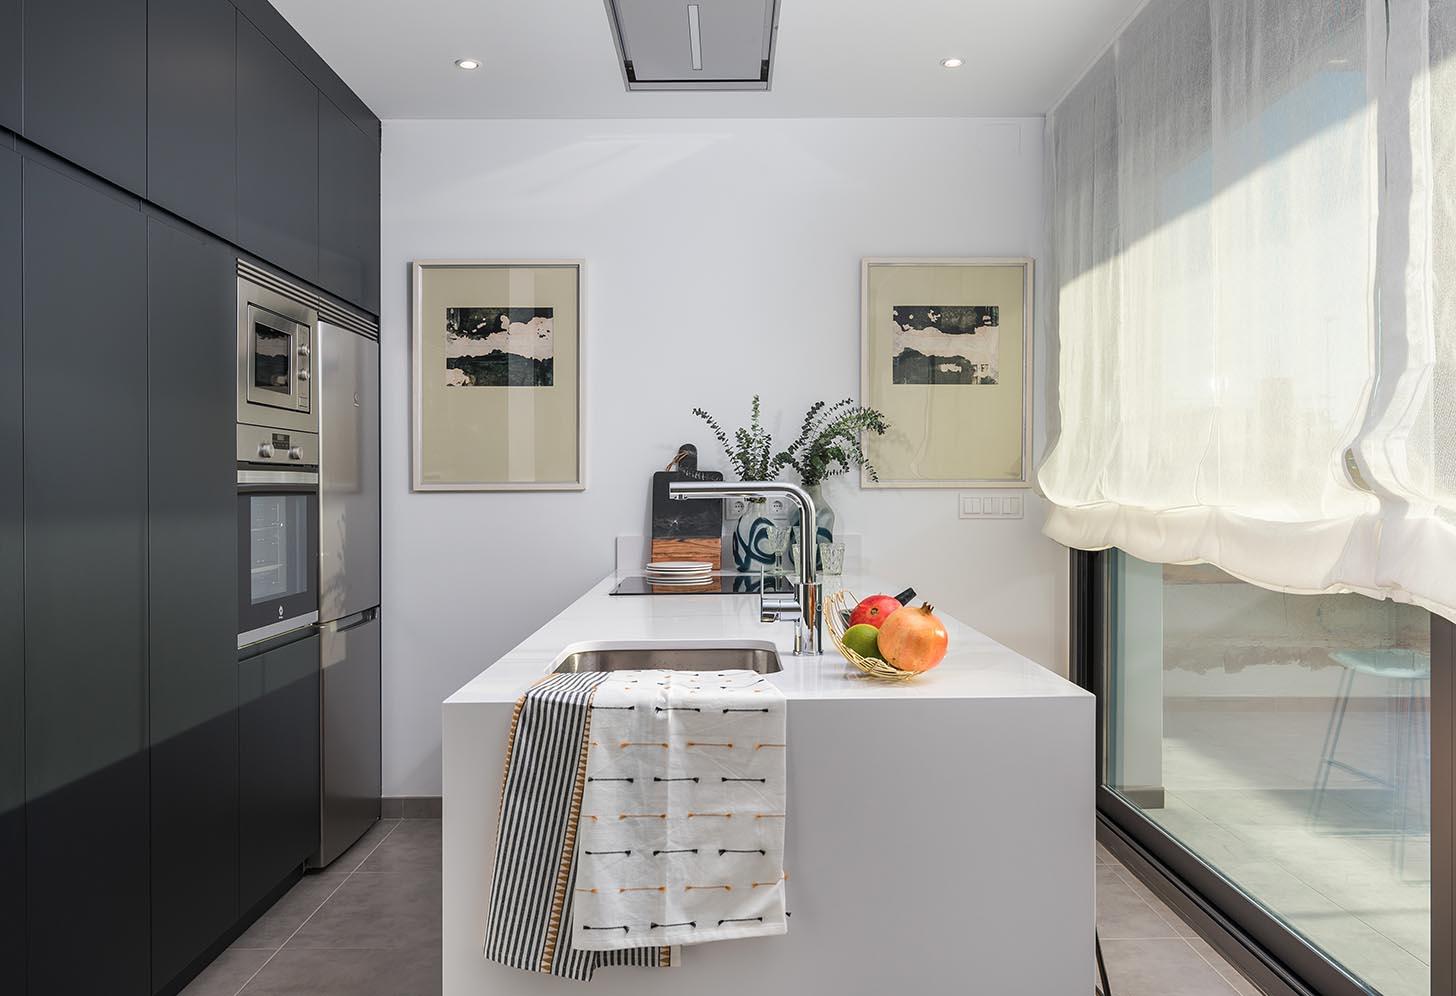 immobilier neuf espagne costa blanca sur alicante dolores cuisine 2